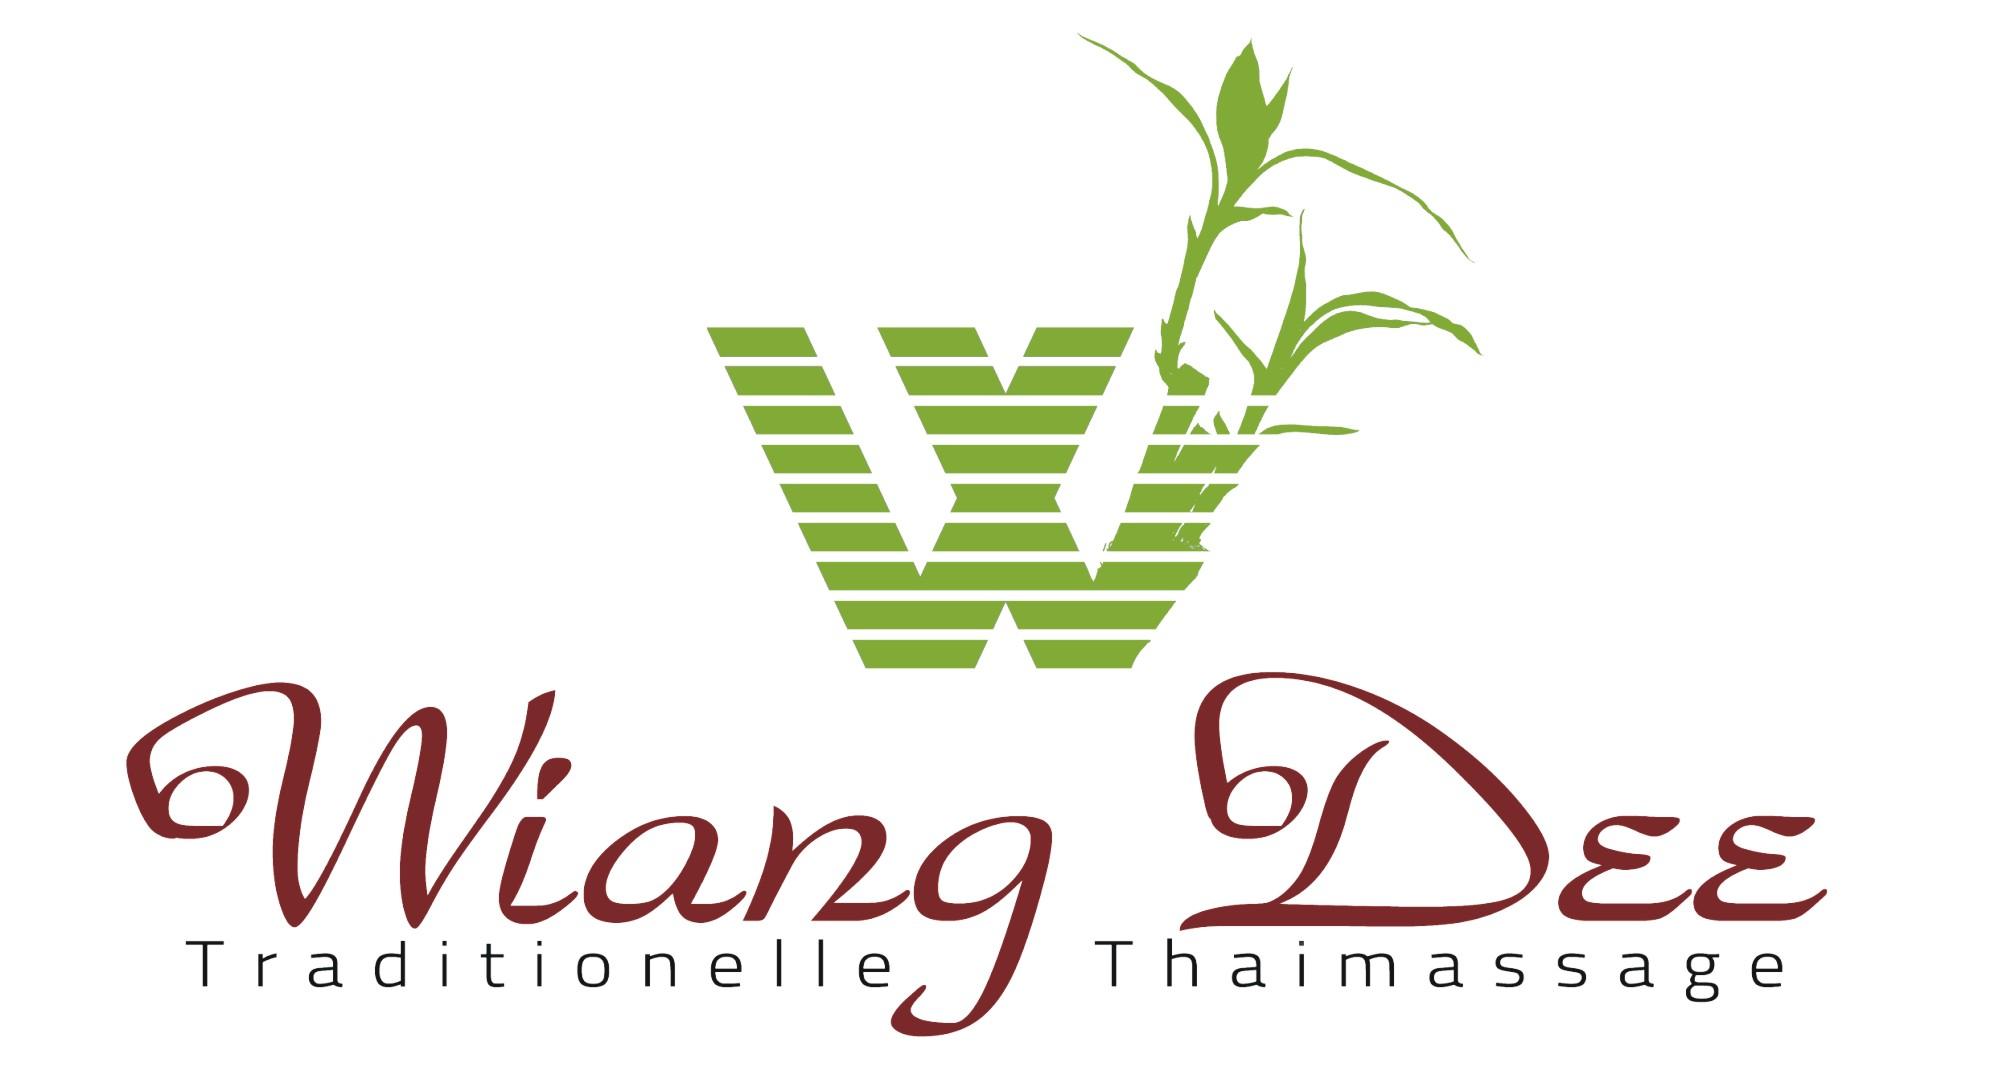 WiangDee-Traditionelle Thaimassage